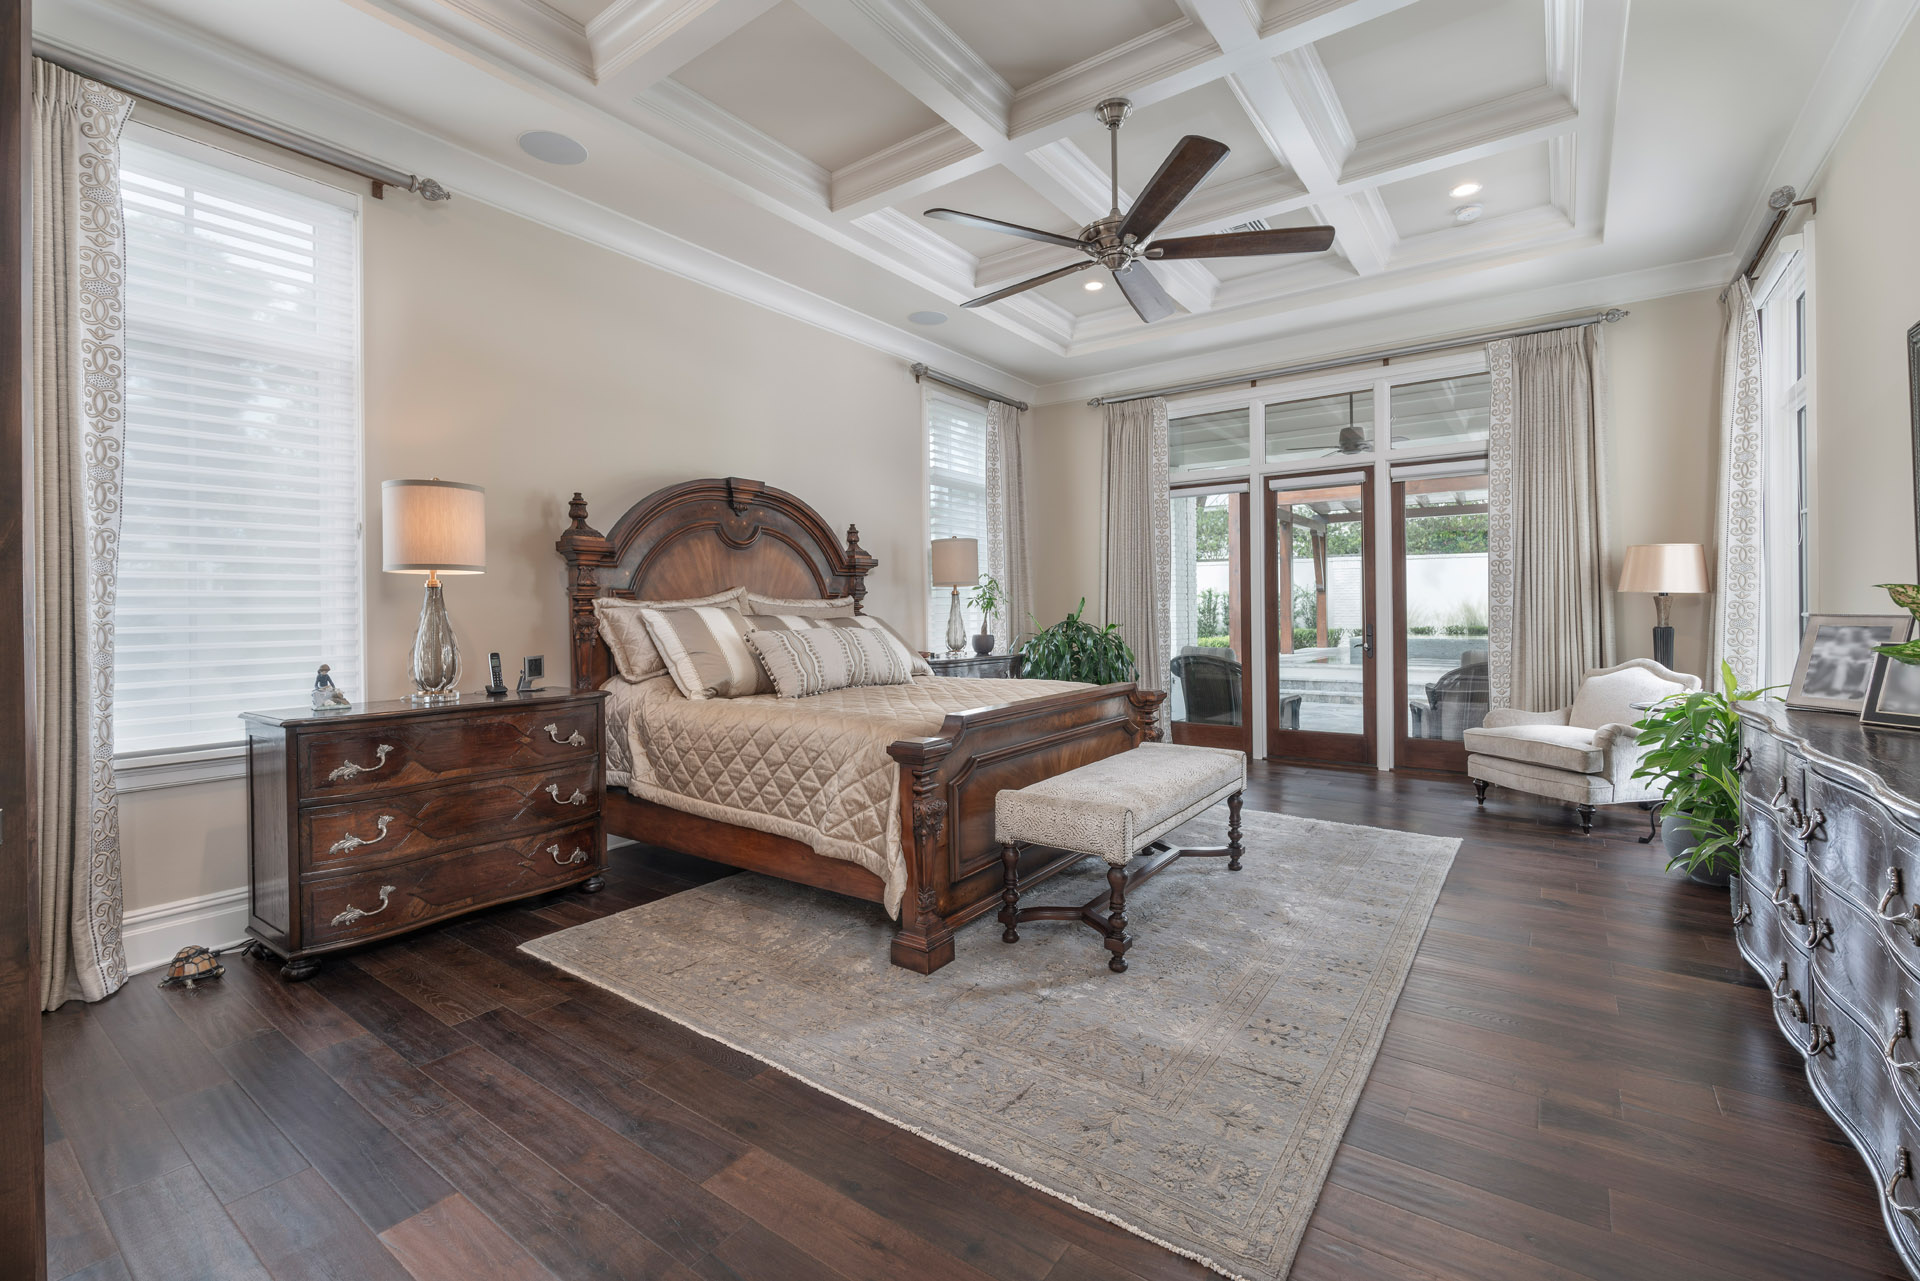 bedroom in custom residential home remodeled by Einheit home builders